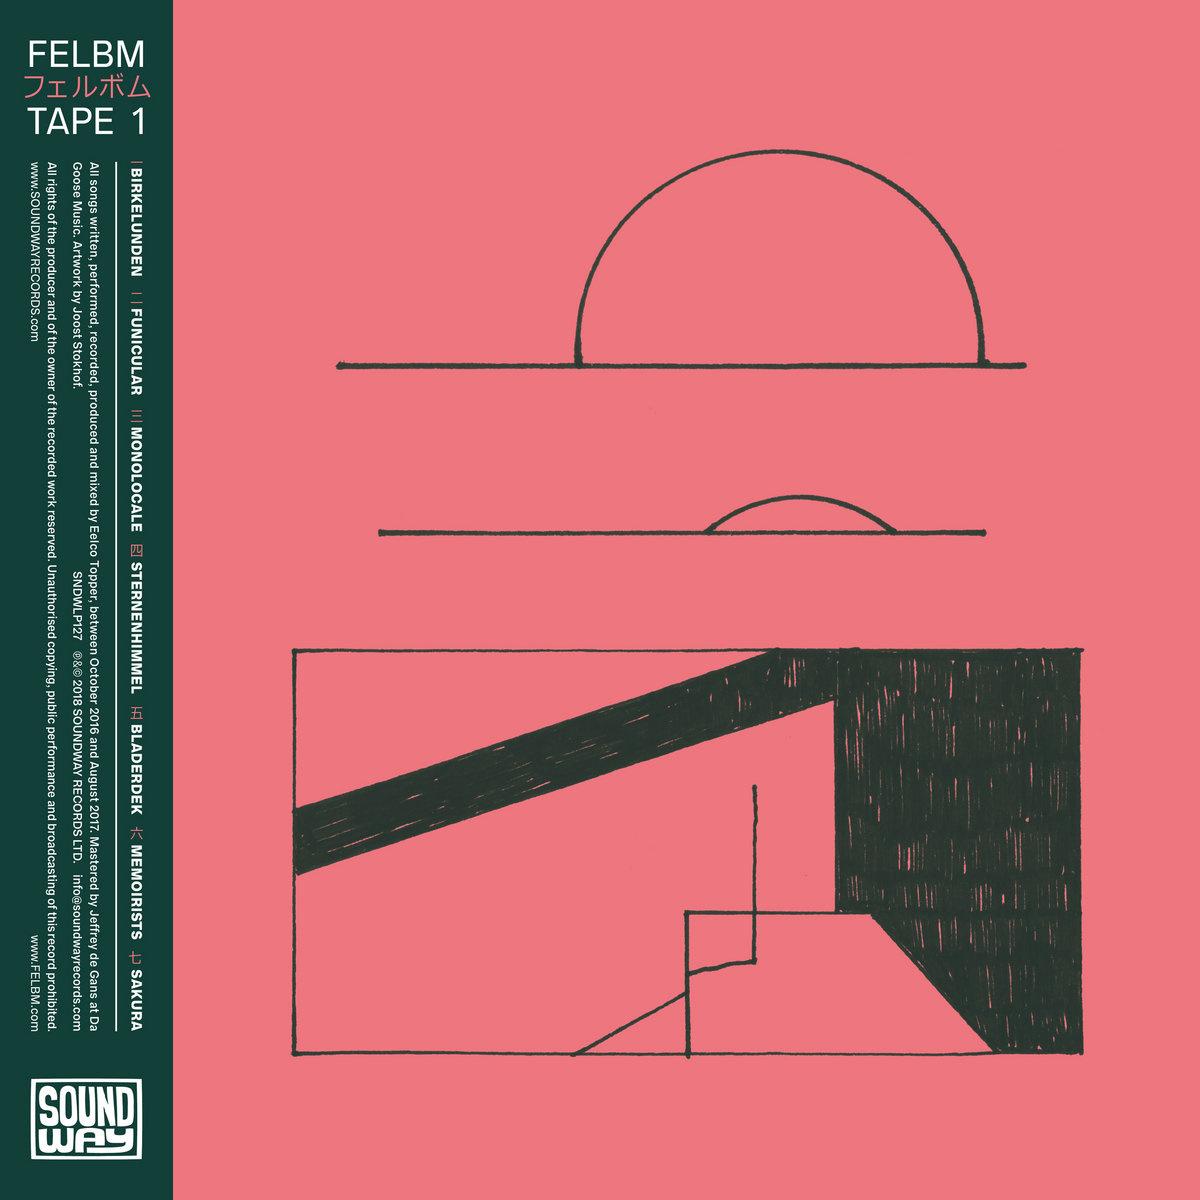 Felbm • Tape 1 / Tape 2-1